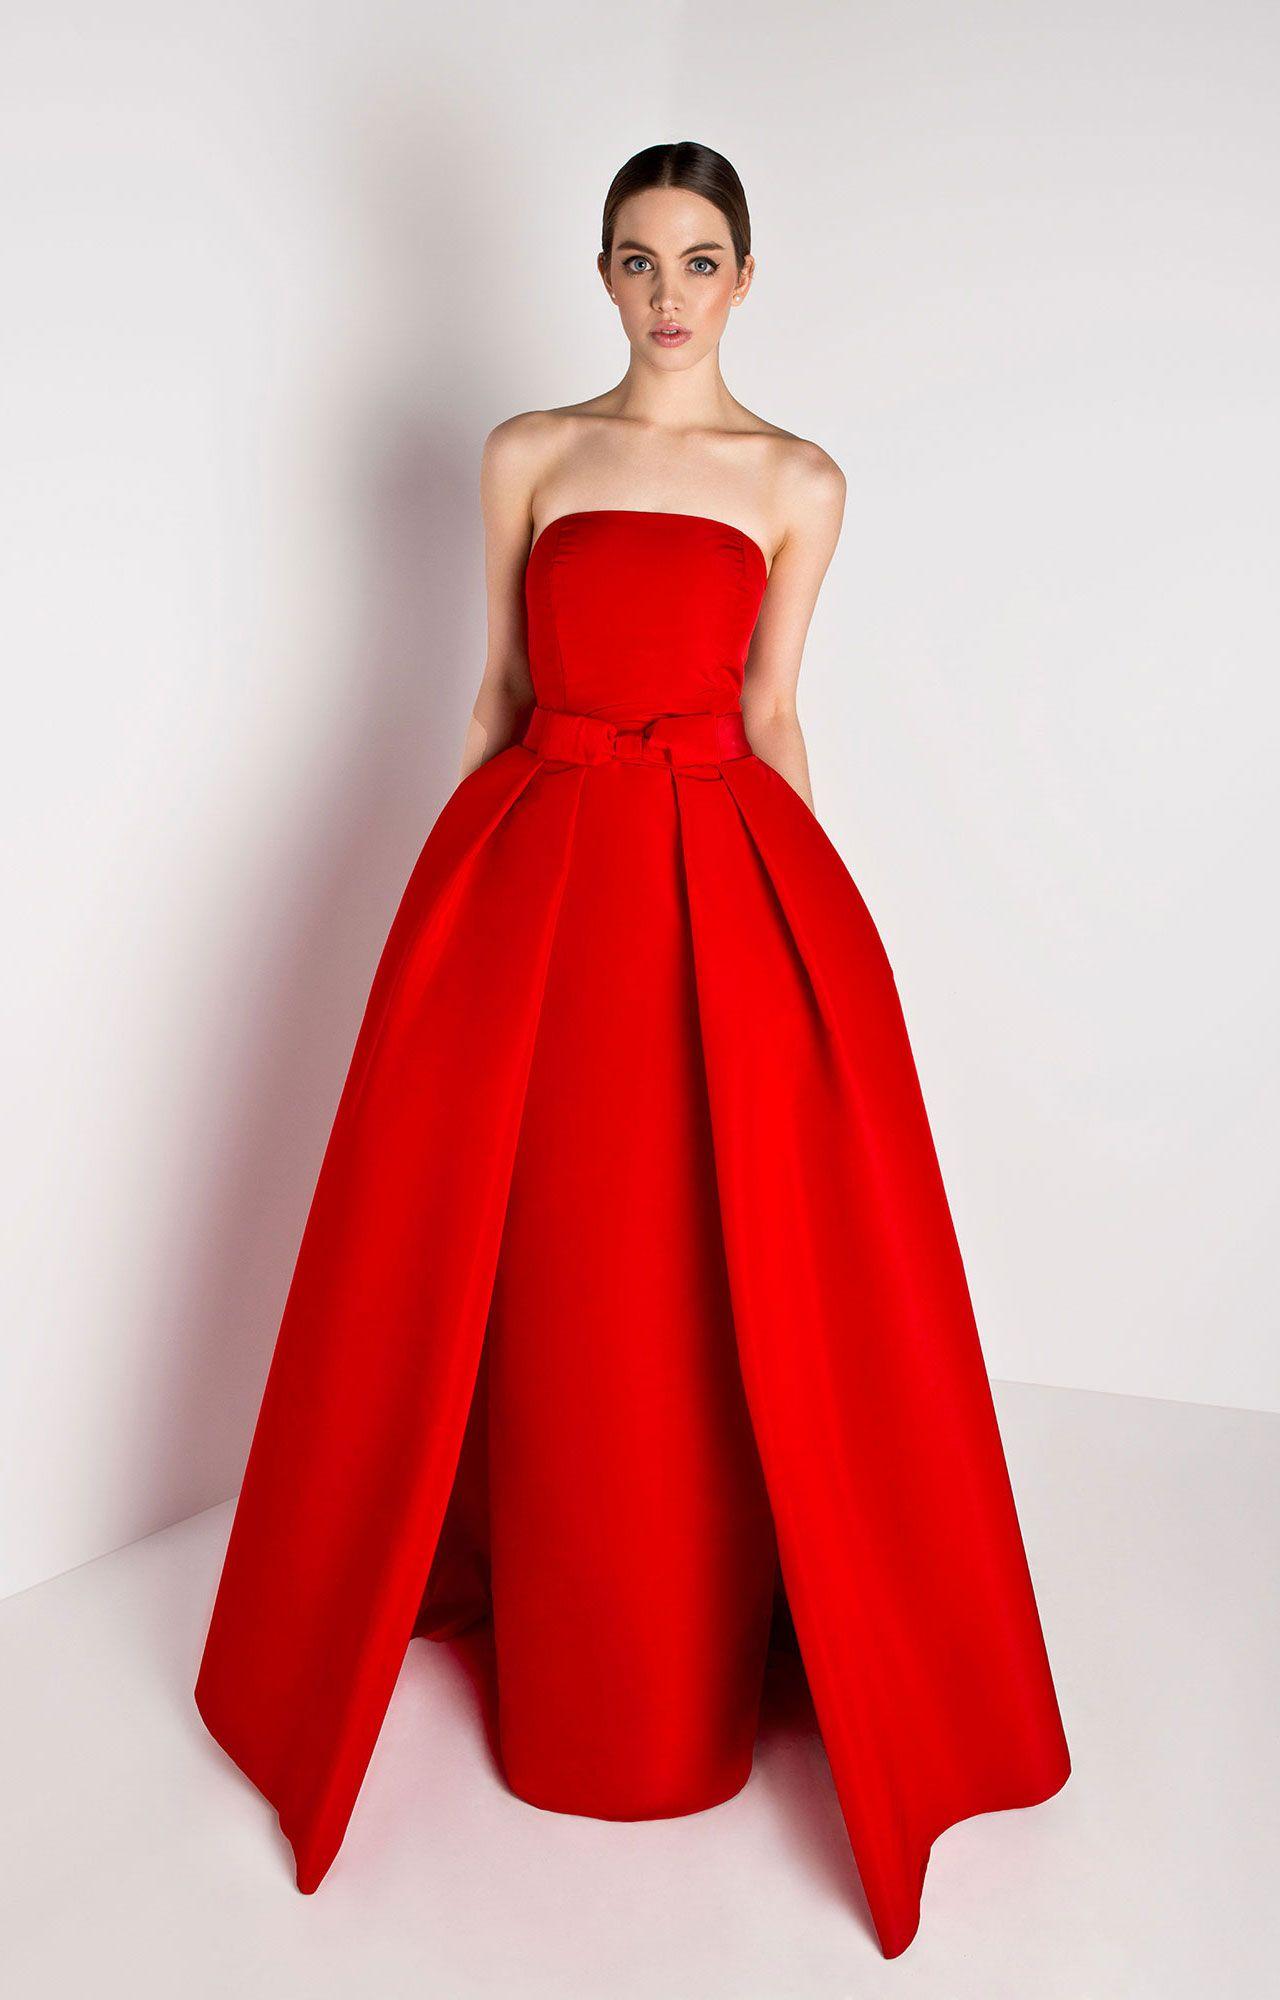 148f60ec238 Silk faille Straight strapless neckline Column skirt with back slit  Concealed back zipper Detachable pleated full skirt with front bow Side  slit pockets ...